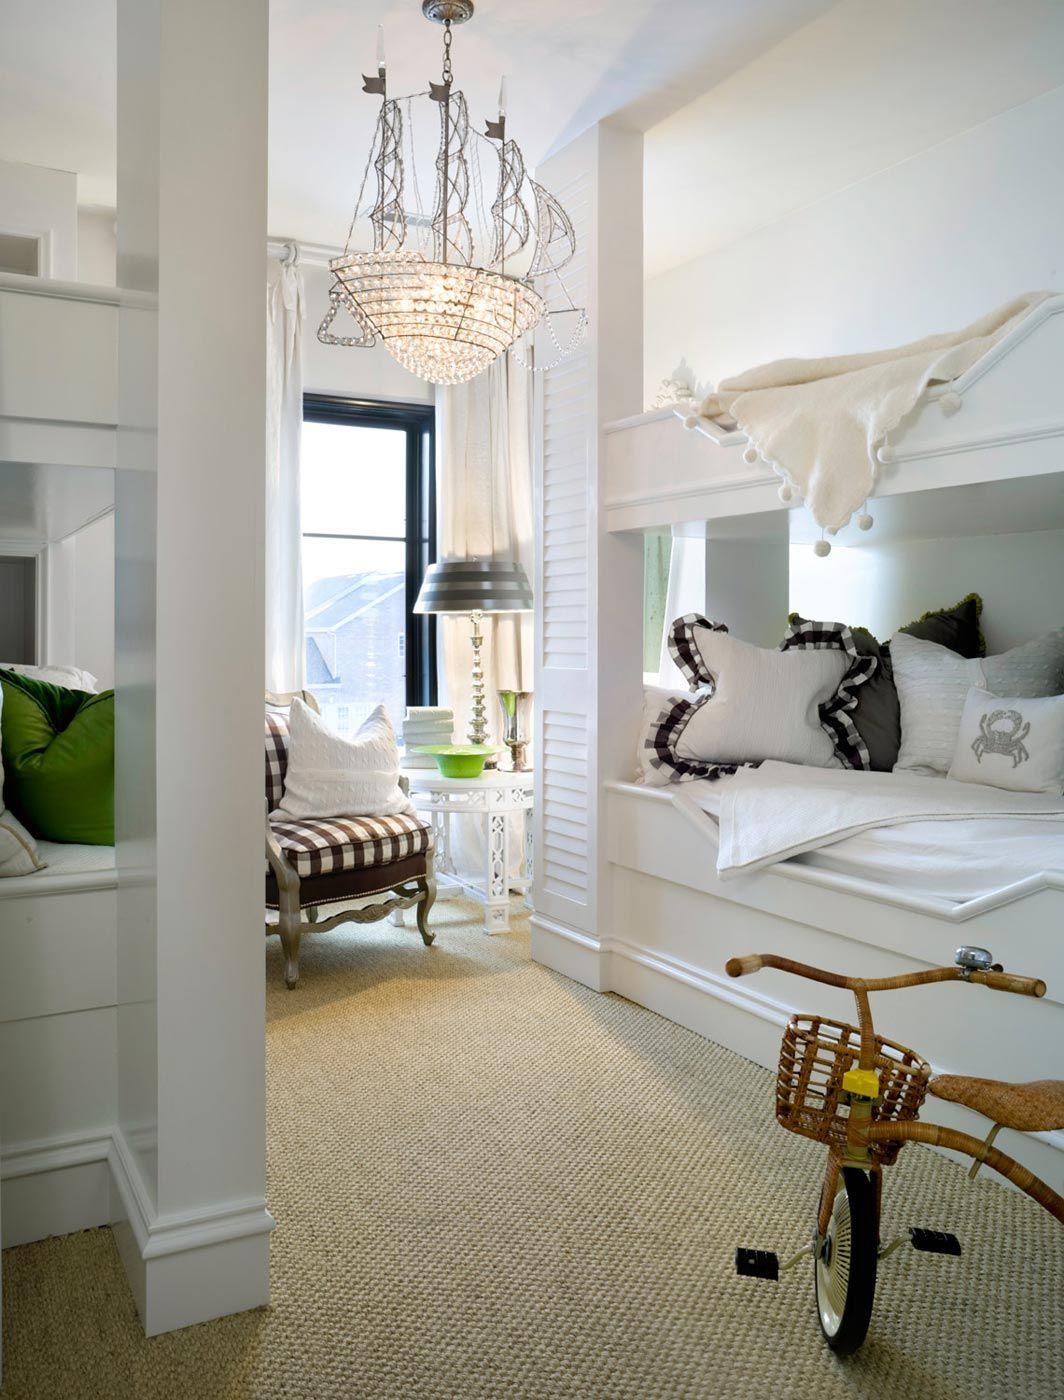 Elegant Bedroom with Built in Bunk BedsGreat for